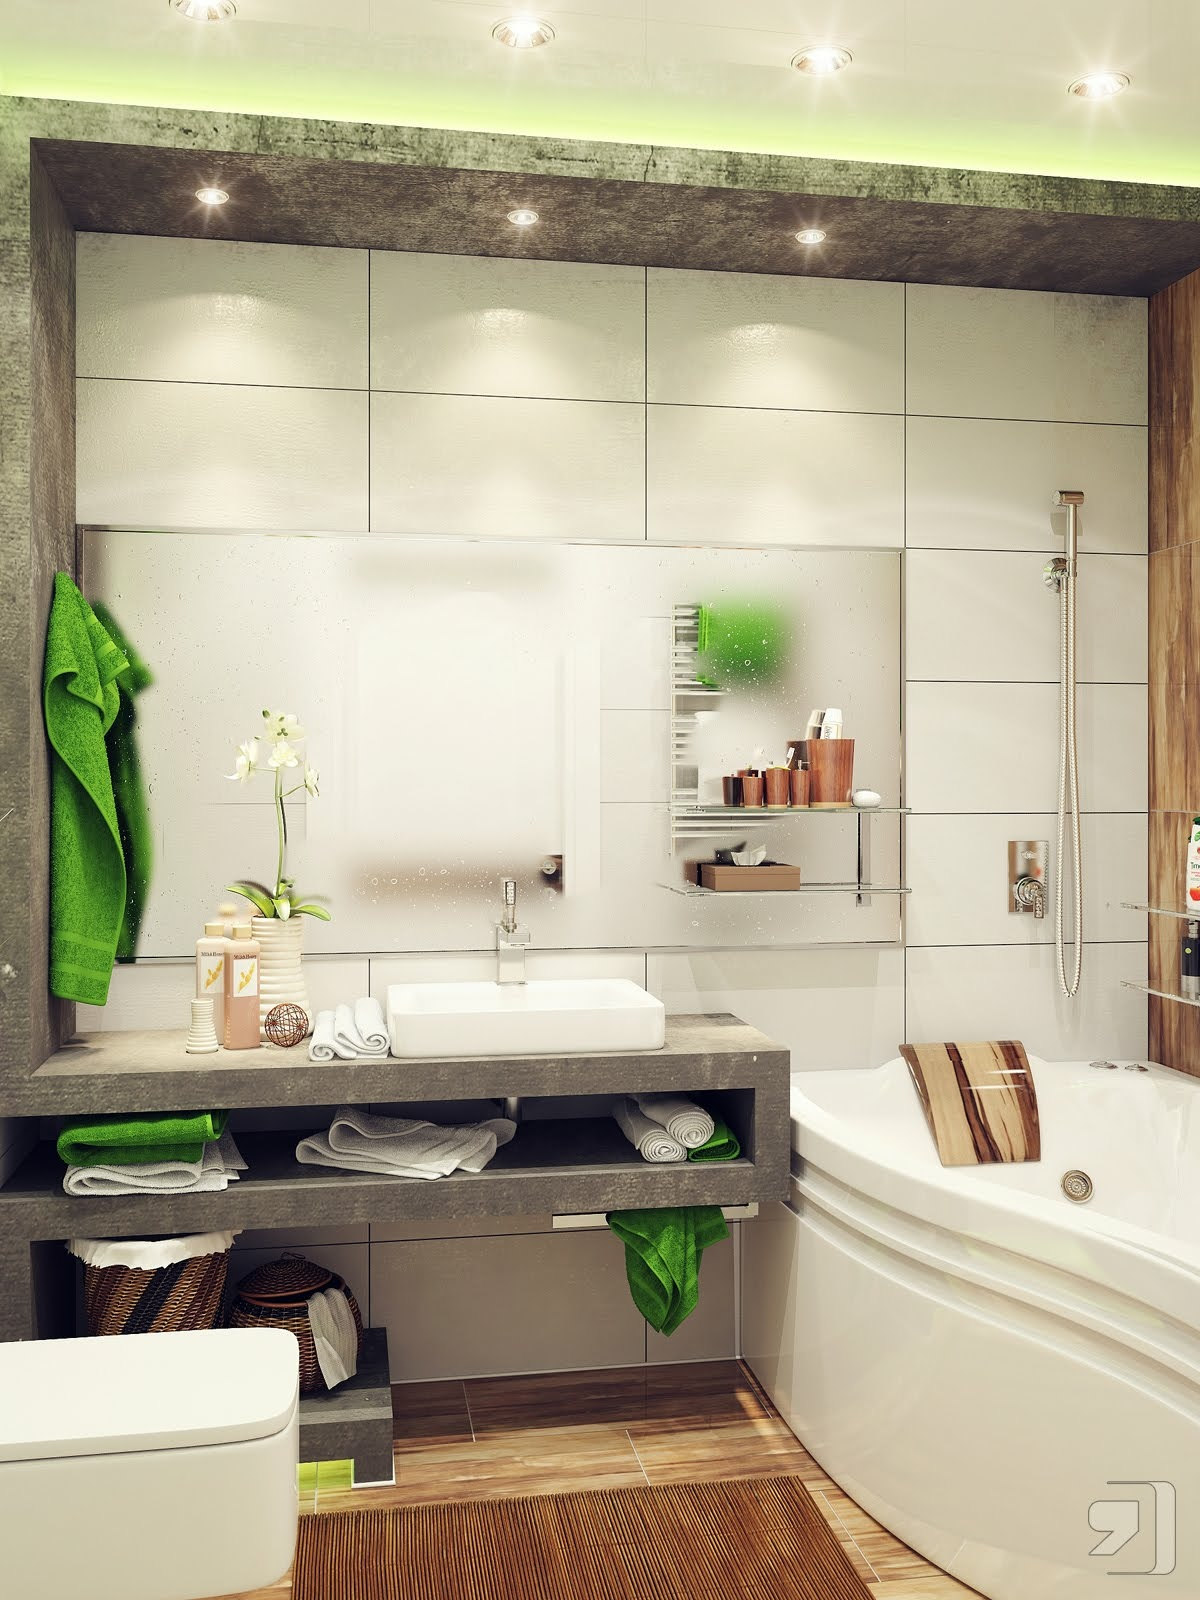 Small Bathroom Design on Small Space:t5Ts6Ke0384= Small Bathroom Ideas  id=50544